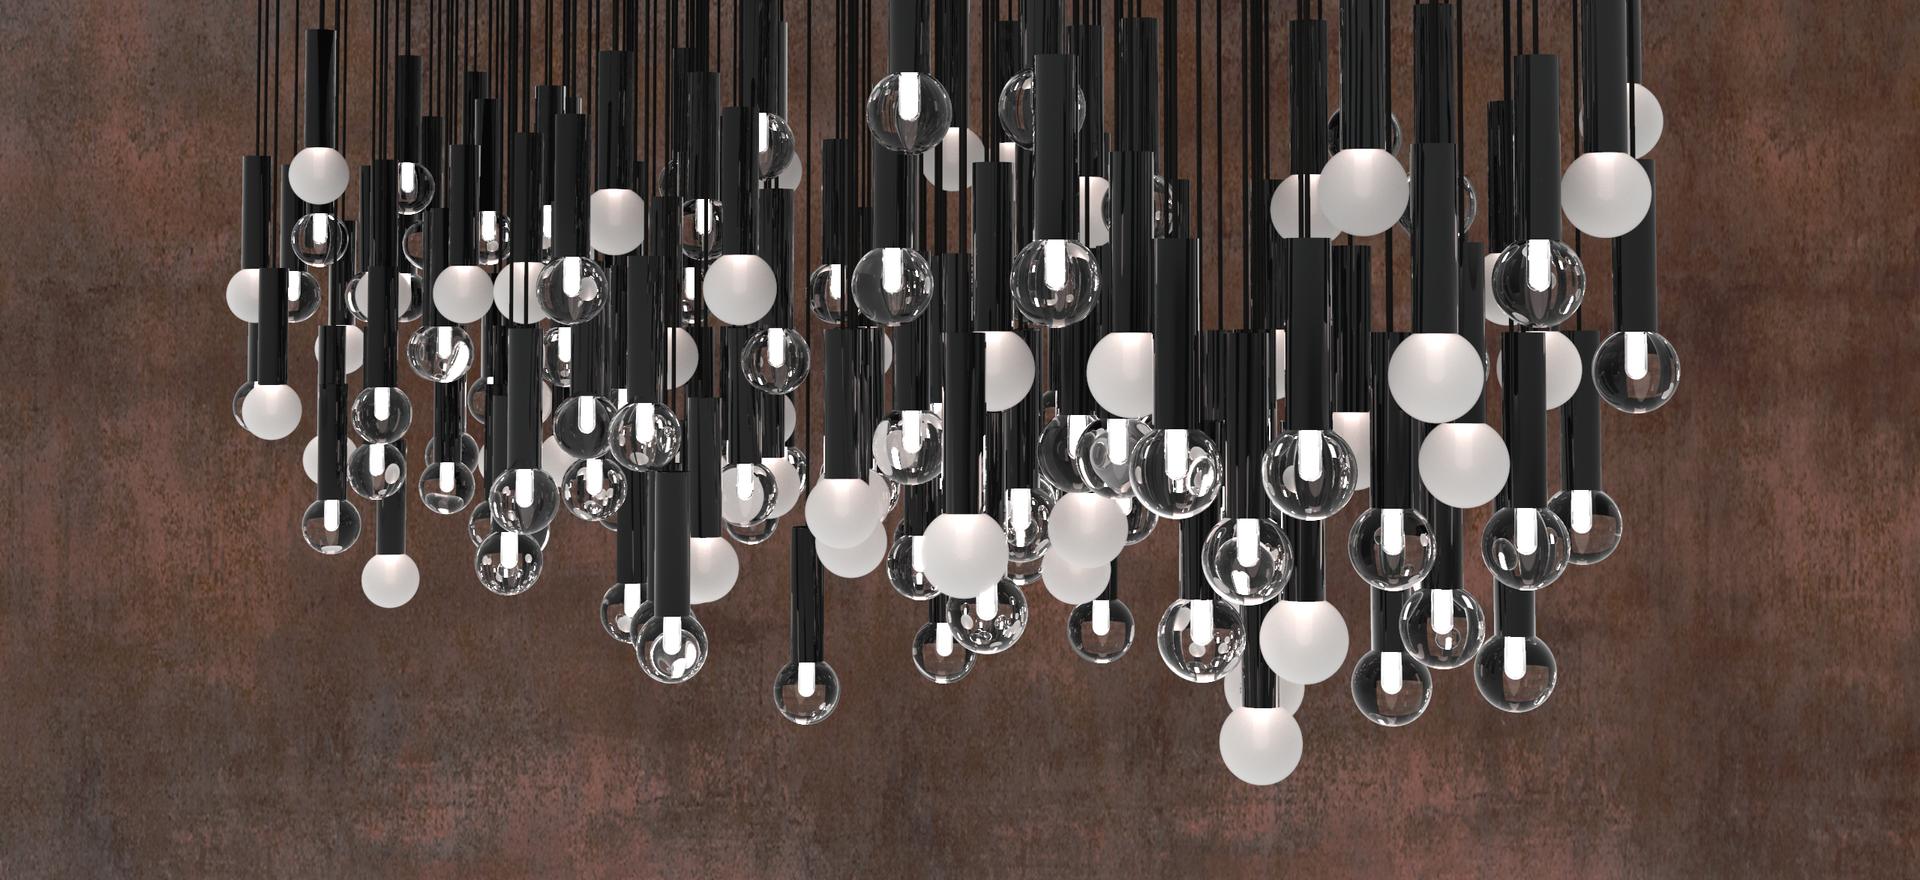 Lighting-Contrast Ratio-Dining Area Chan